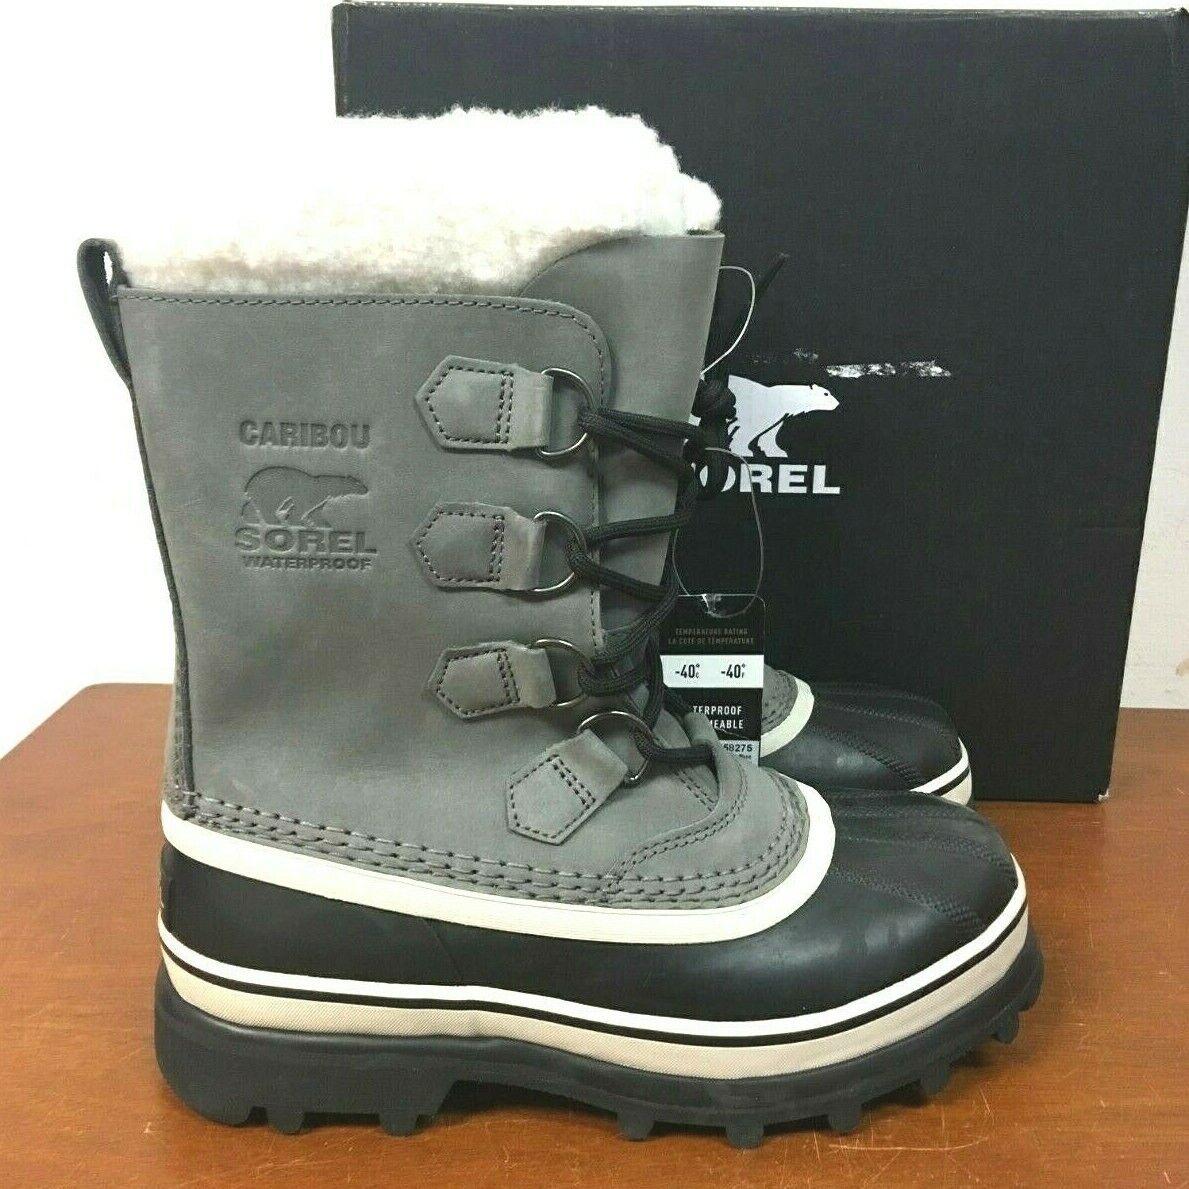 SOREL Women's Caribou Waterproof Rain Snow Winter Boots GRAY